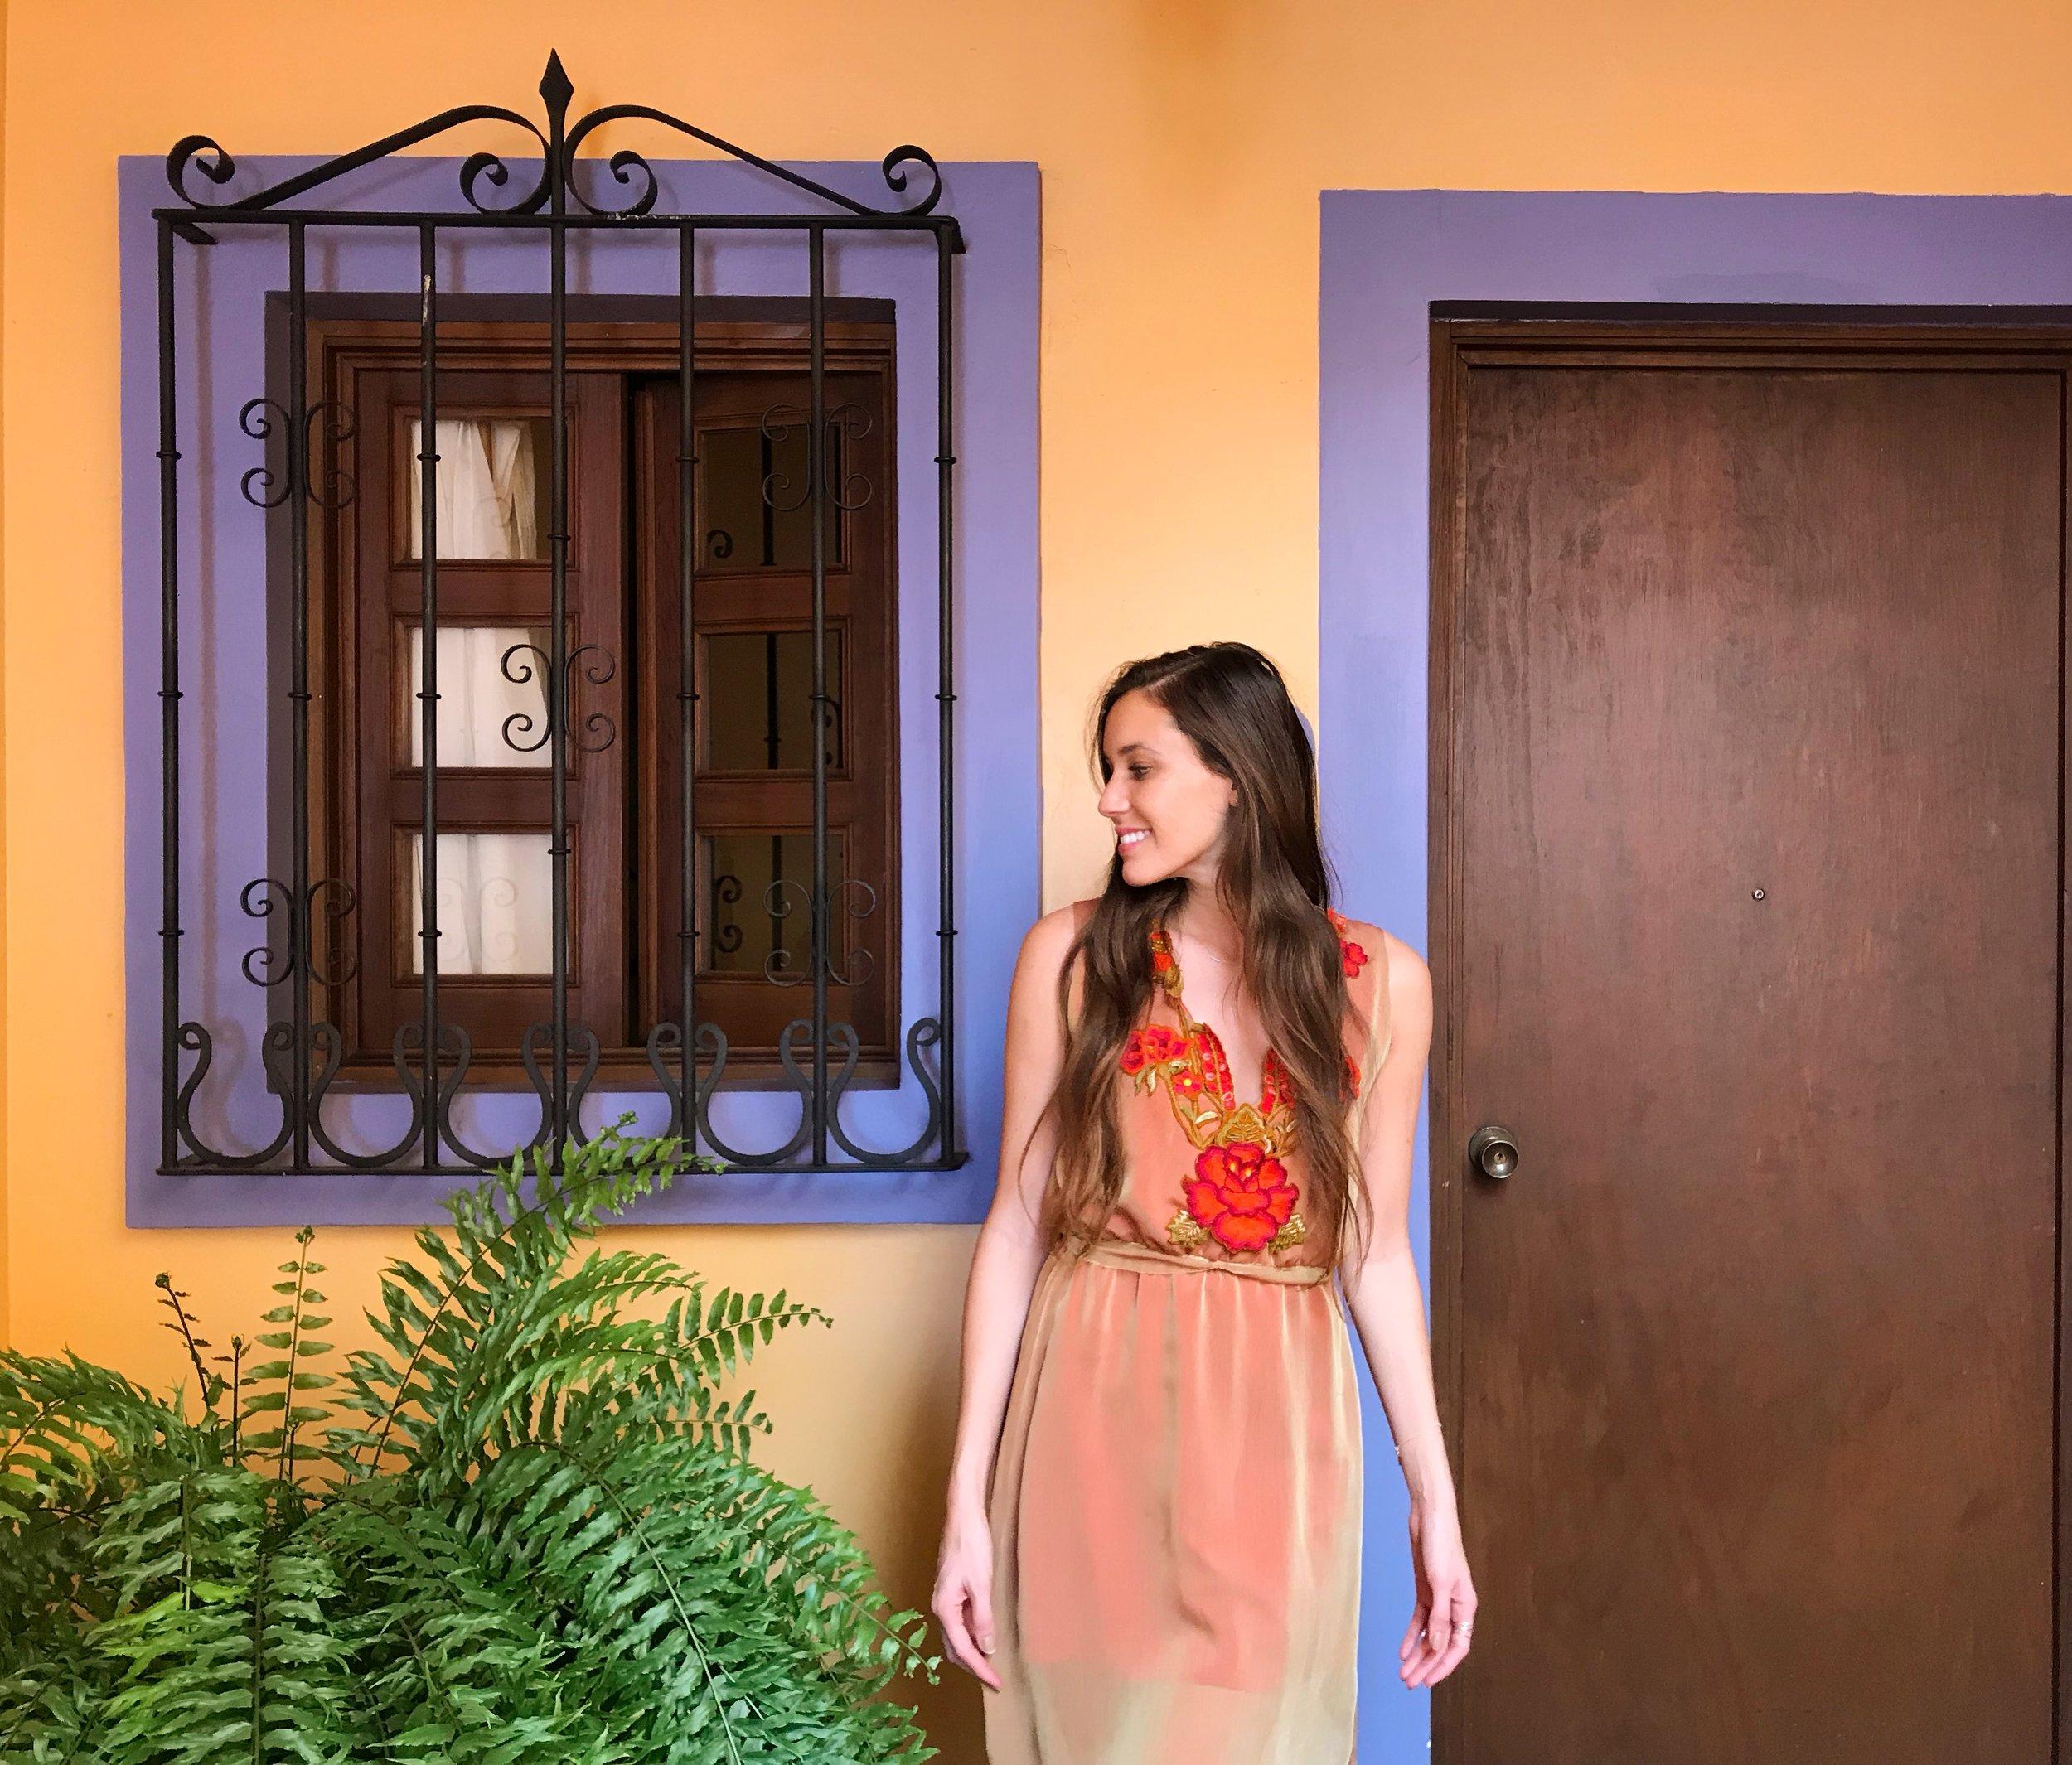 carina otero wearing an original mano madre design (which can also be worn in reverse) at hostal de la noria, oaxaca